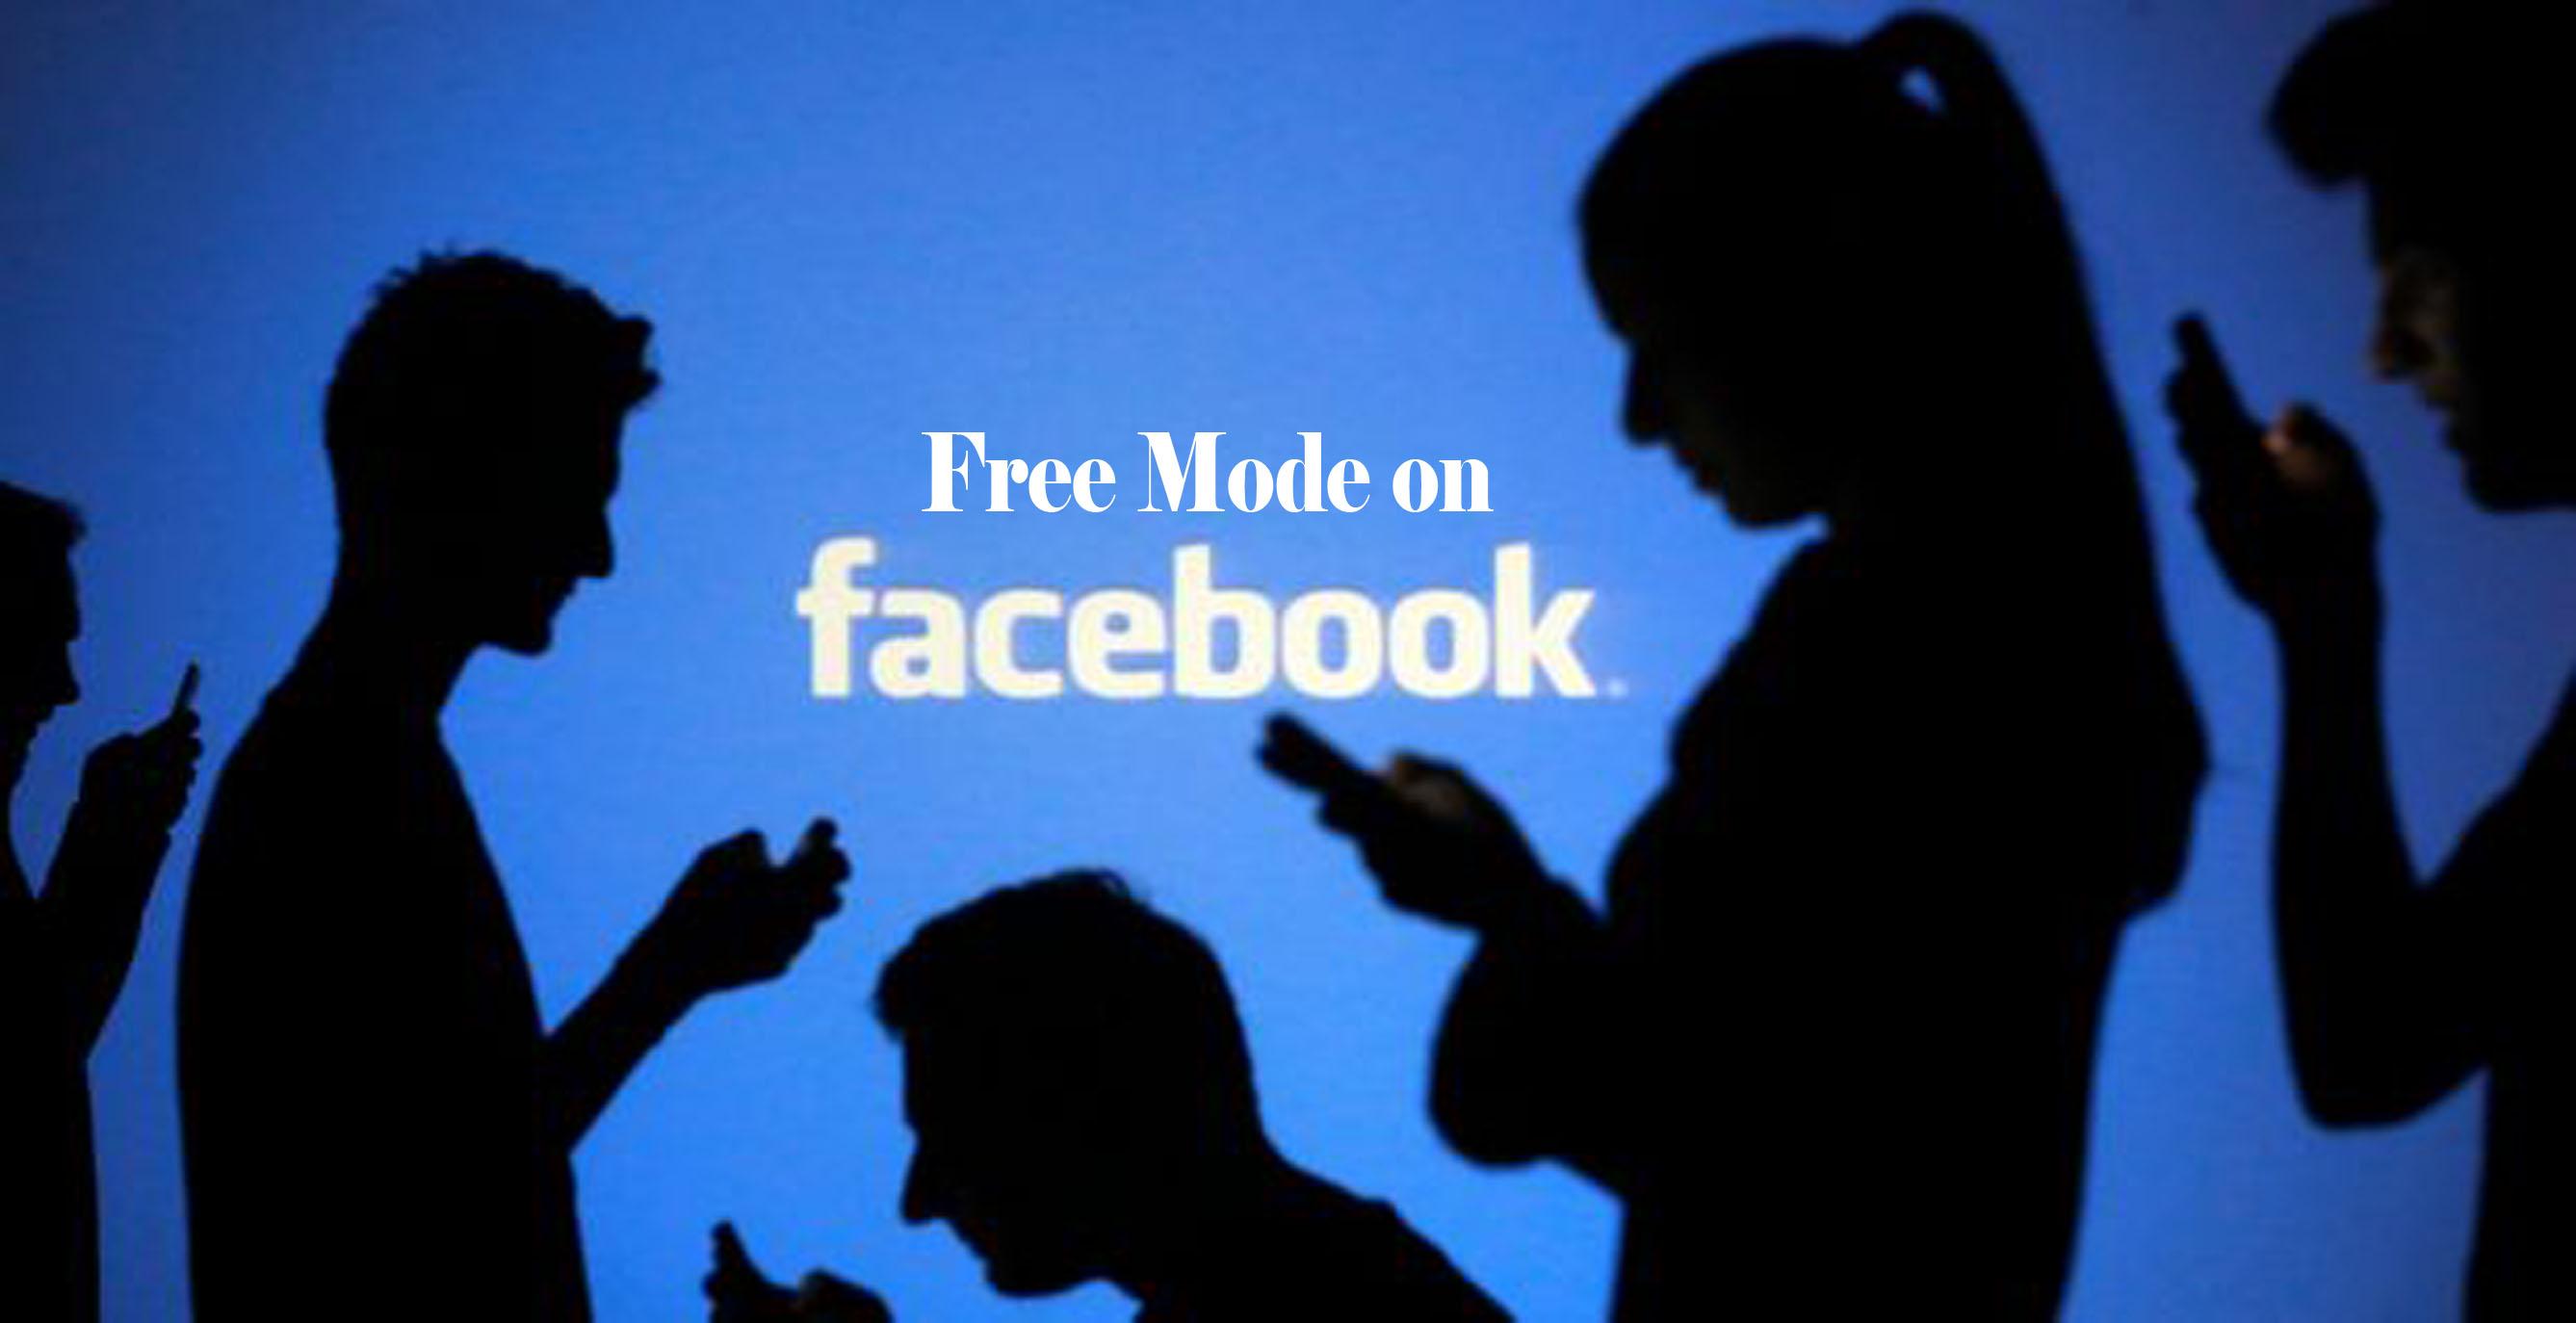 Facebook Free Mode – Free Mode Facebook Settings | www.Facebook.com